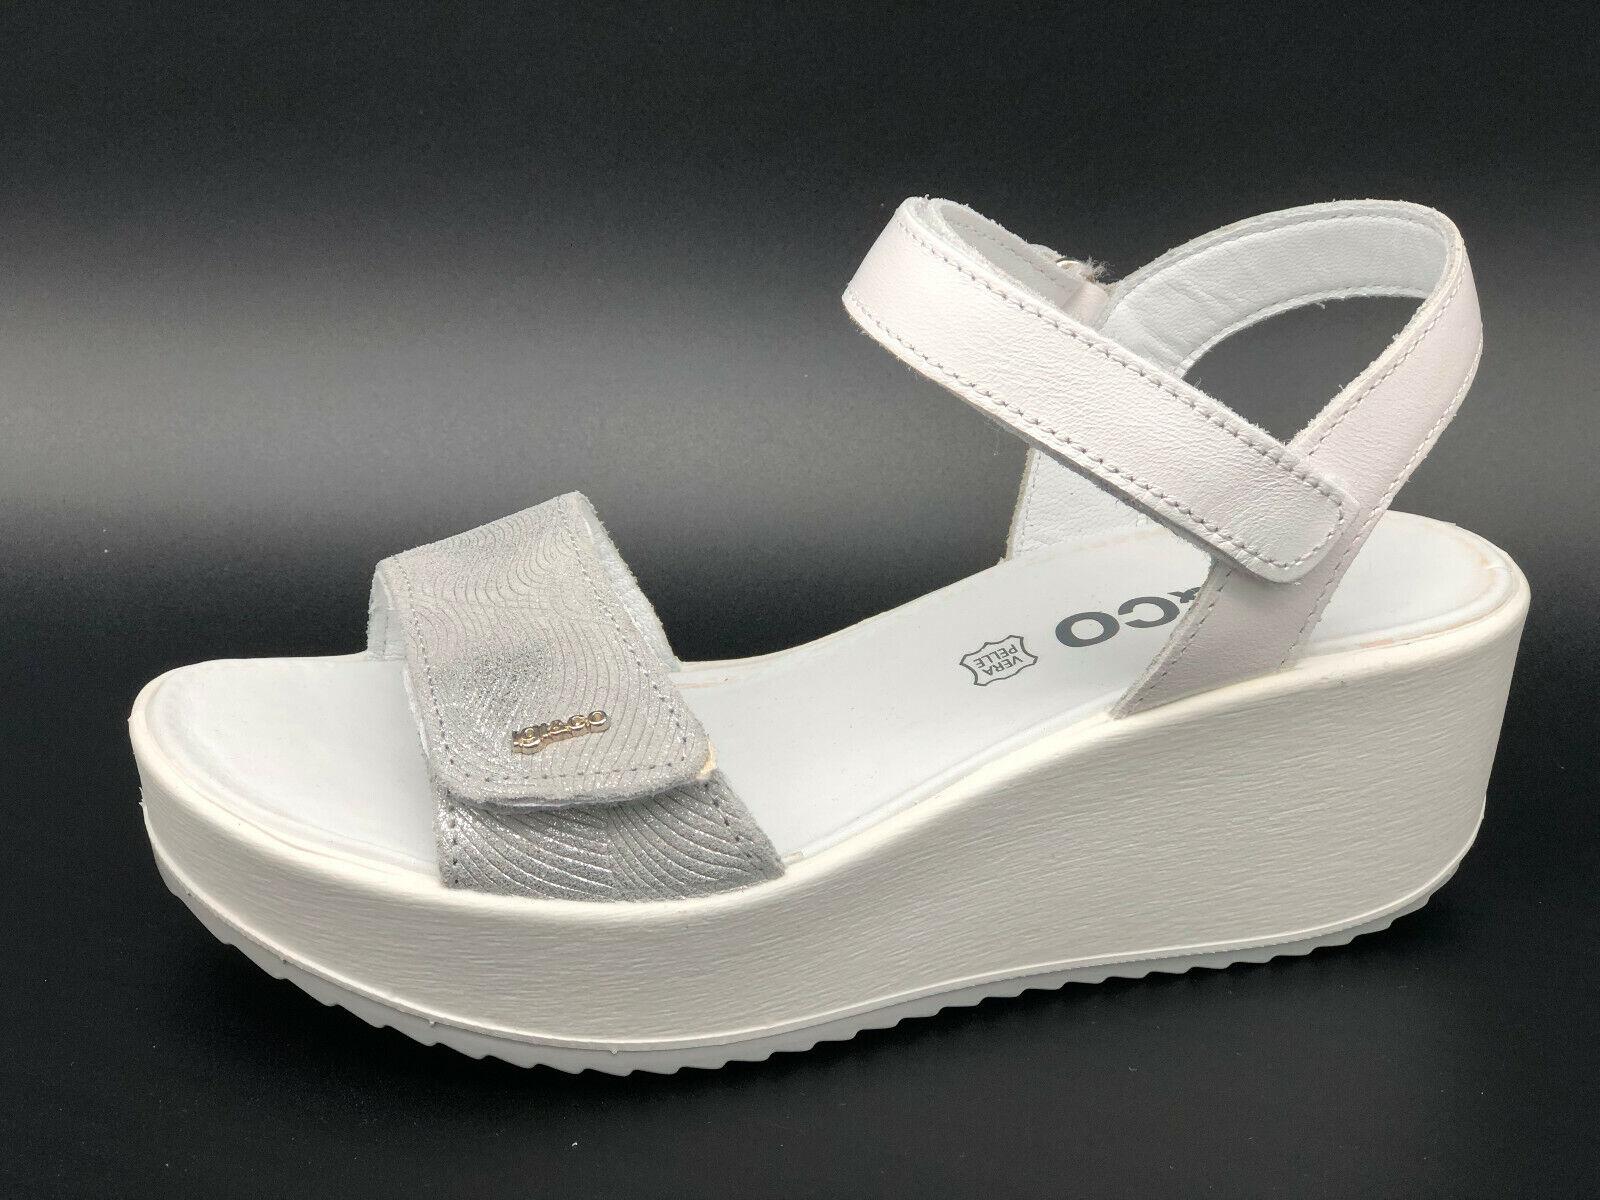 Sandali strappo Igi&co 3173177 pelle blancoo e plata zeppa 6 cm